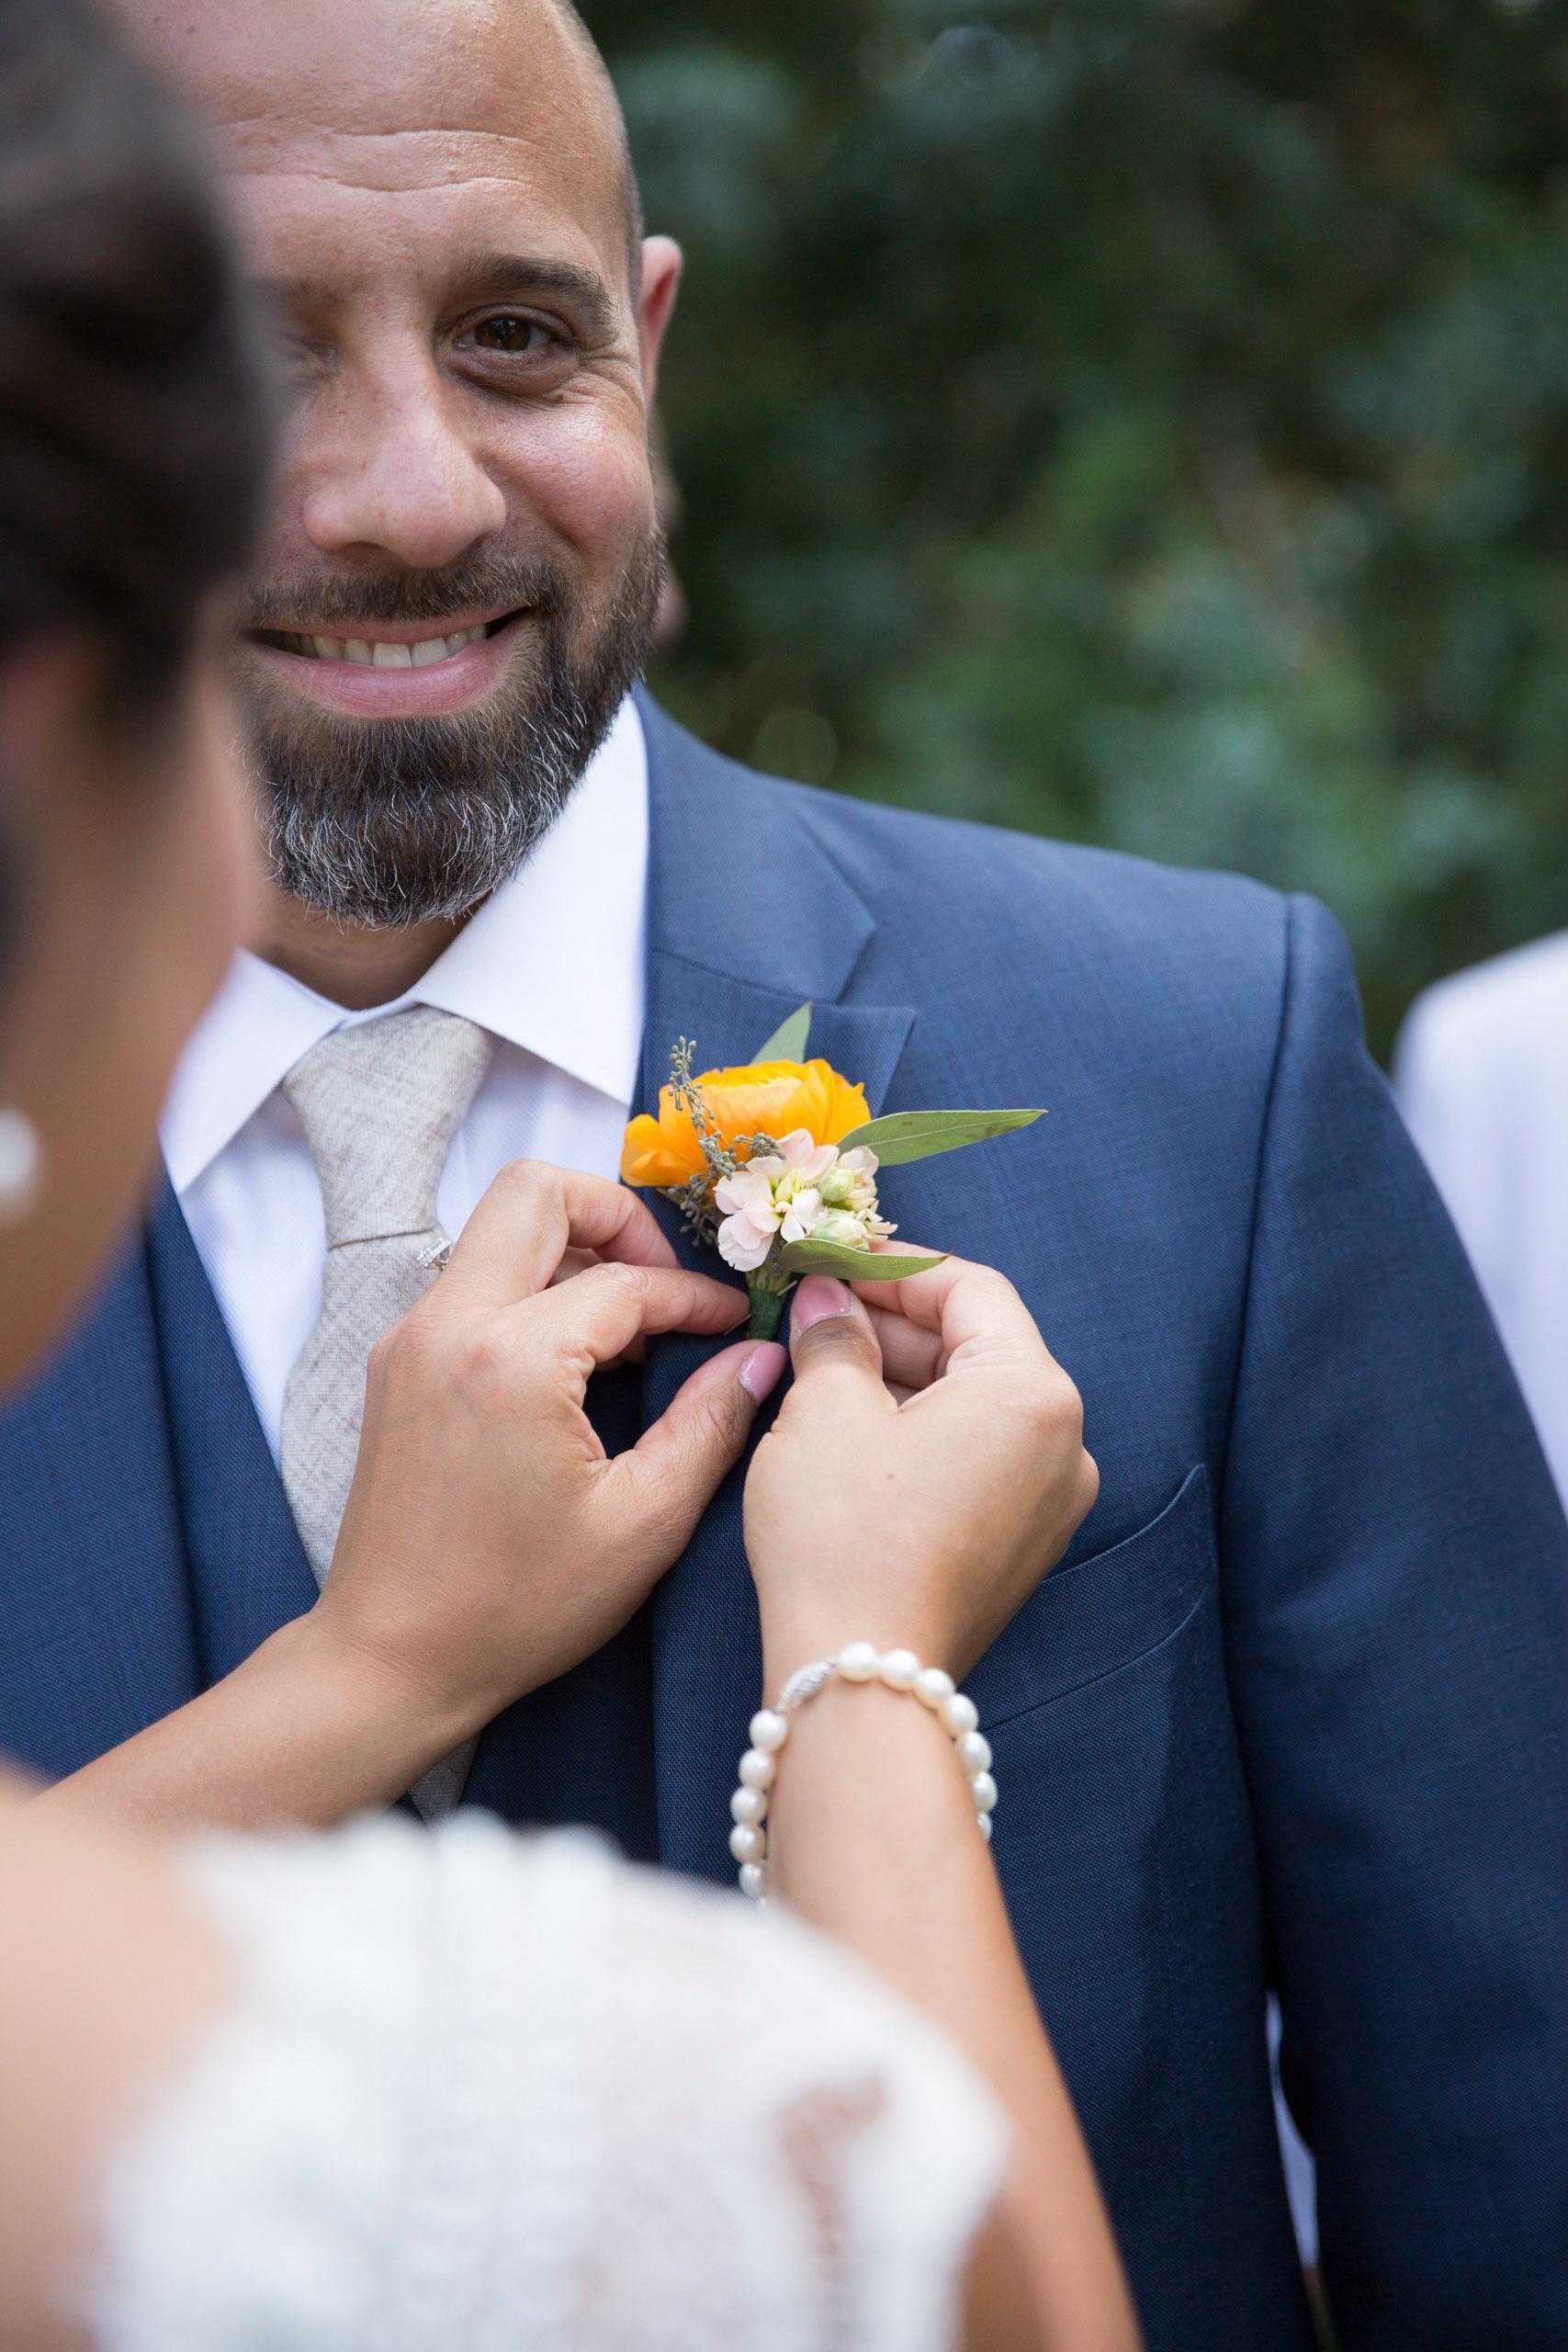 intimate garden wedding planners, new jersey, NYC, phildelphia destination wedding planners - scarlet plan & design - coral, hot pink, peach, tangerine, tropical summer wedding ( (35).jpg